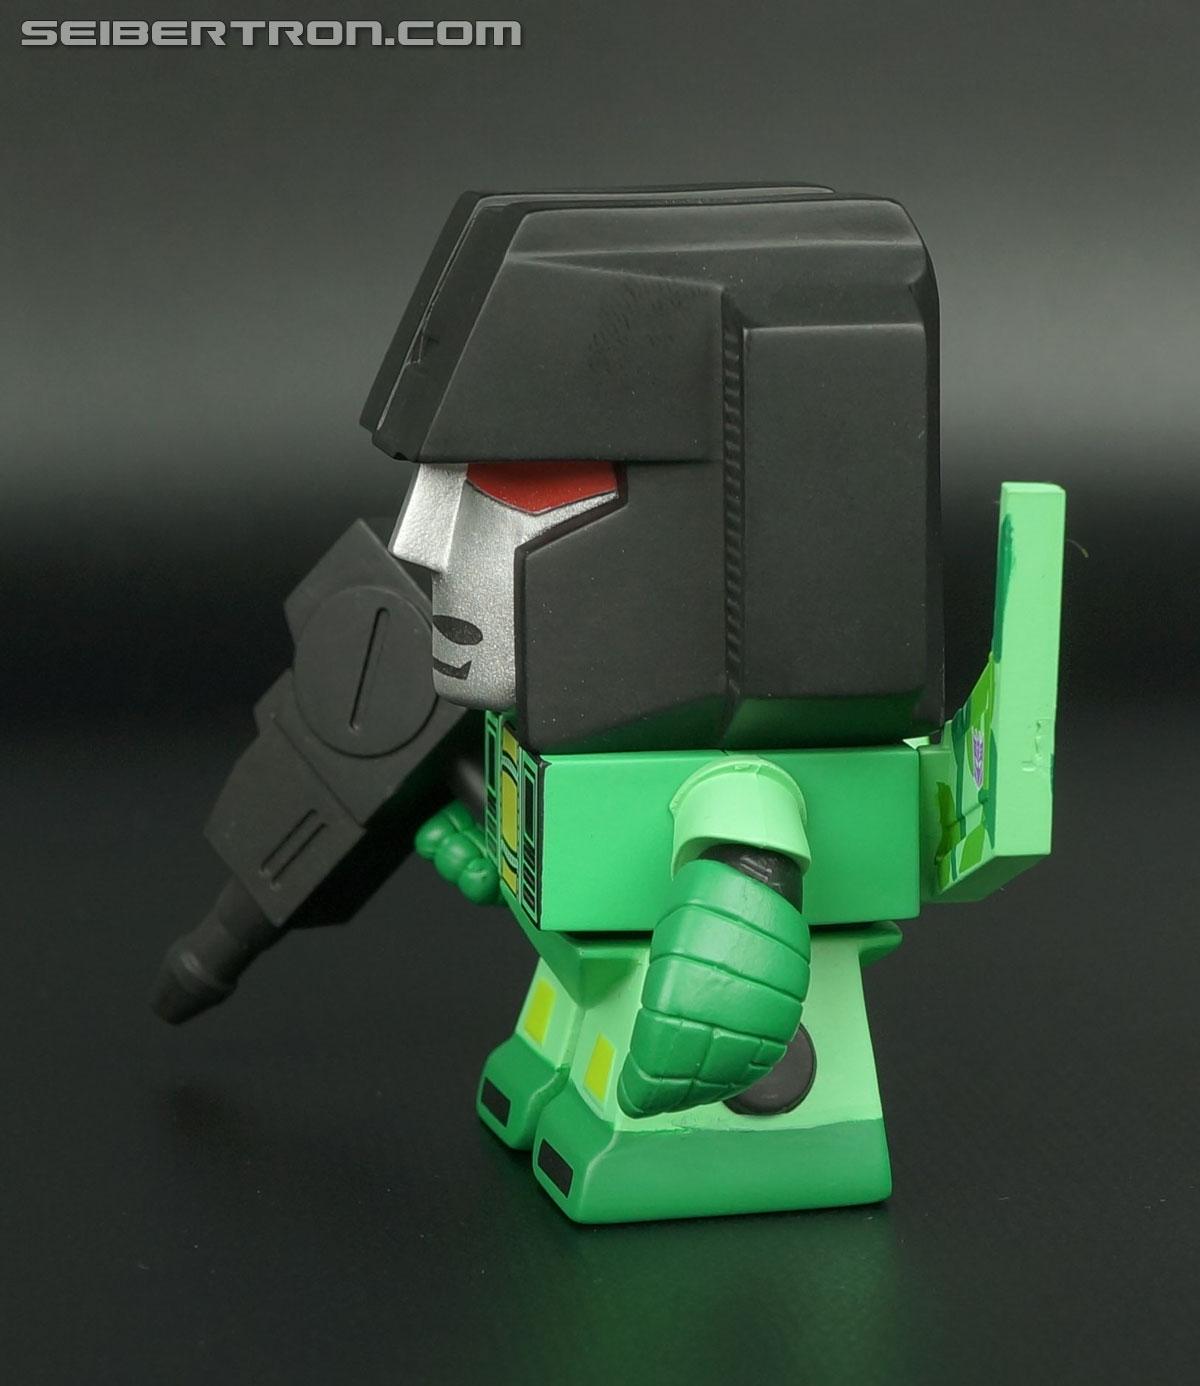 Transformers Loyal Subjects Rainmaker (Green) (Acid Storm) (Image #22 of 40)